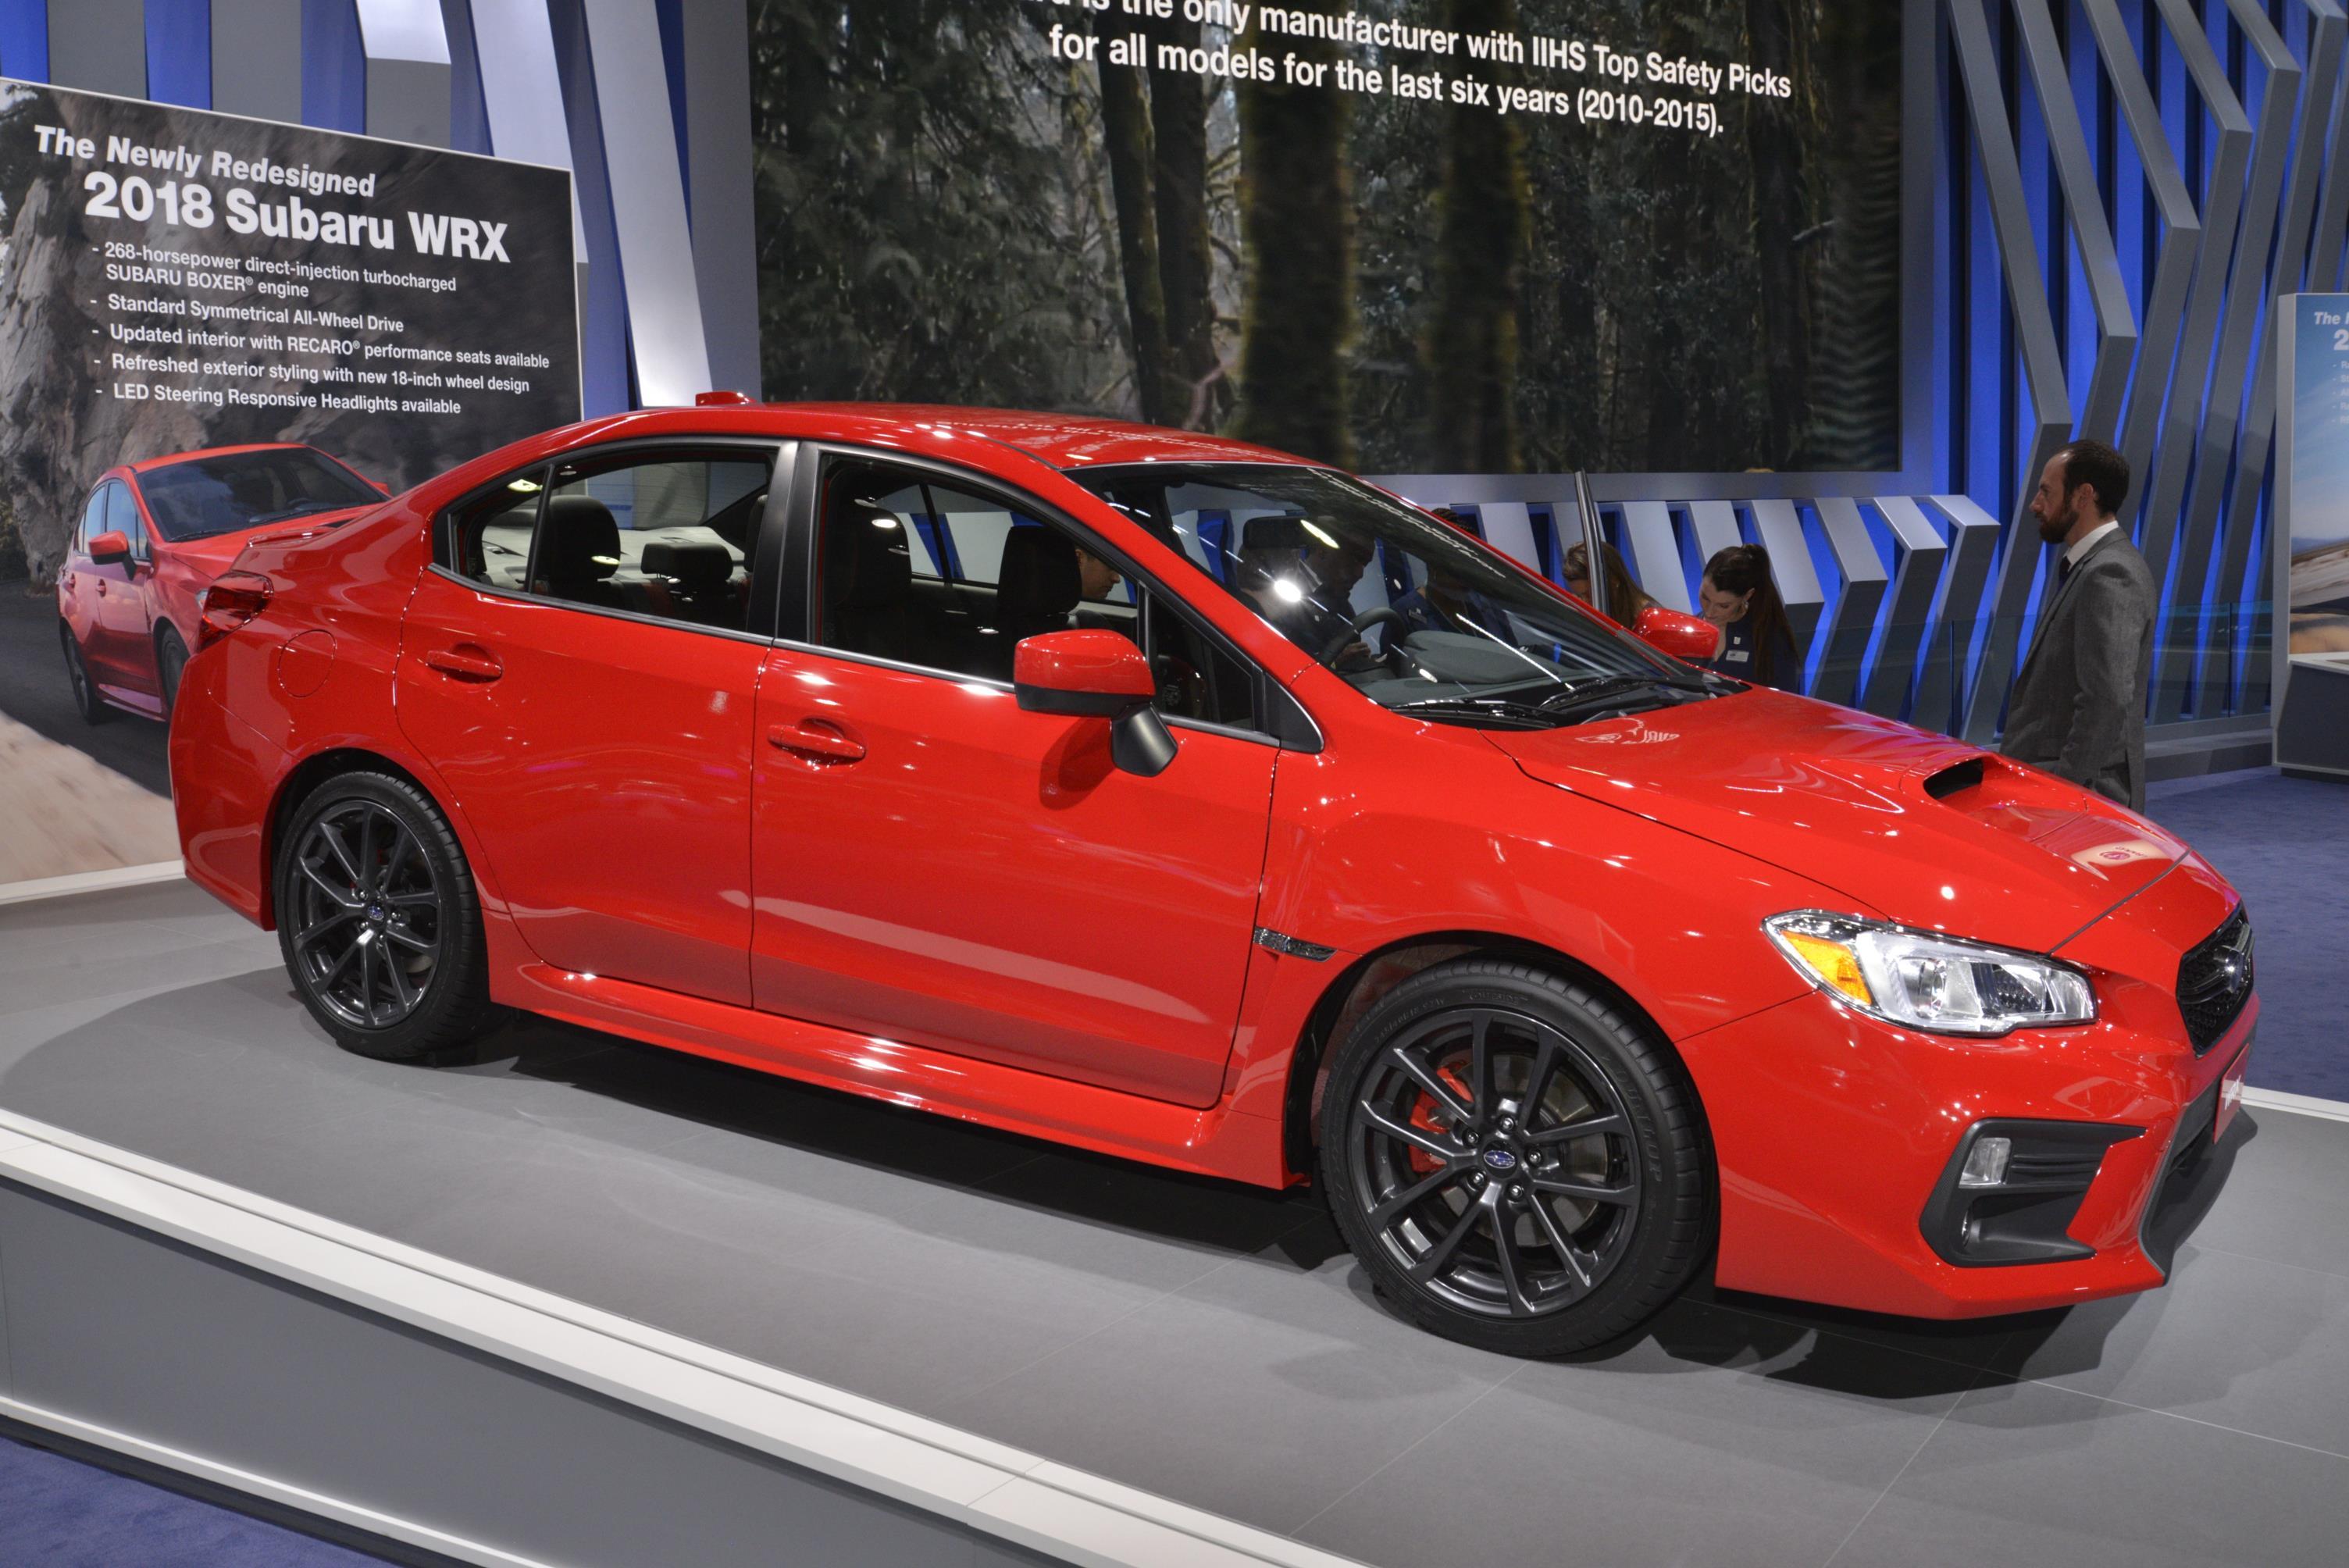 2018 subaru sti interior. Simple Interior 2018 Subaru WRX And STI Live From Detroit In Subaru Sti Interior